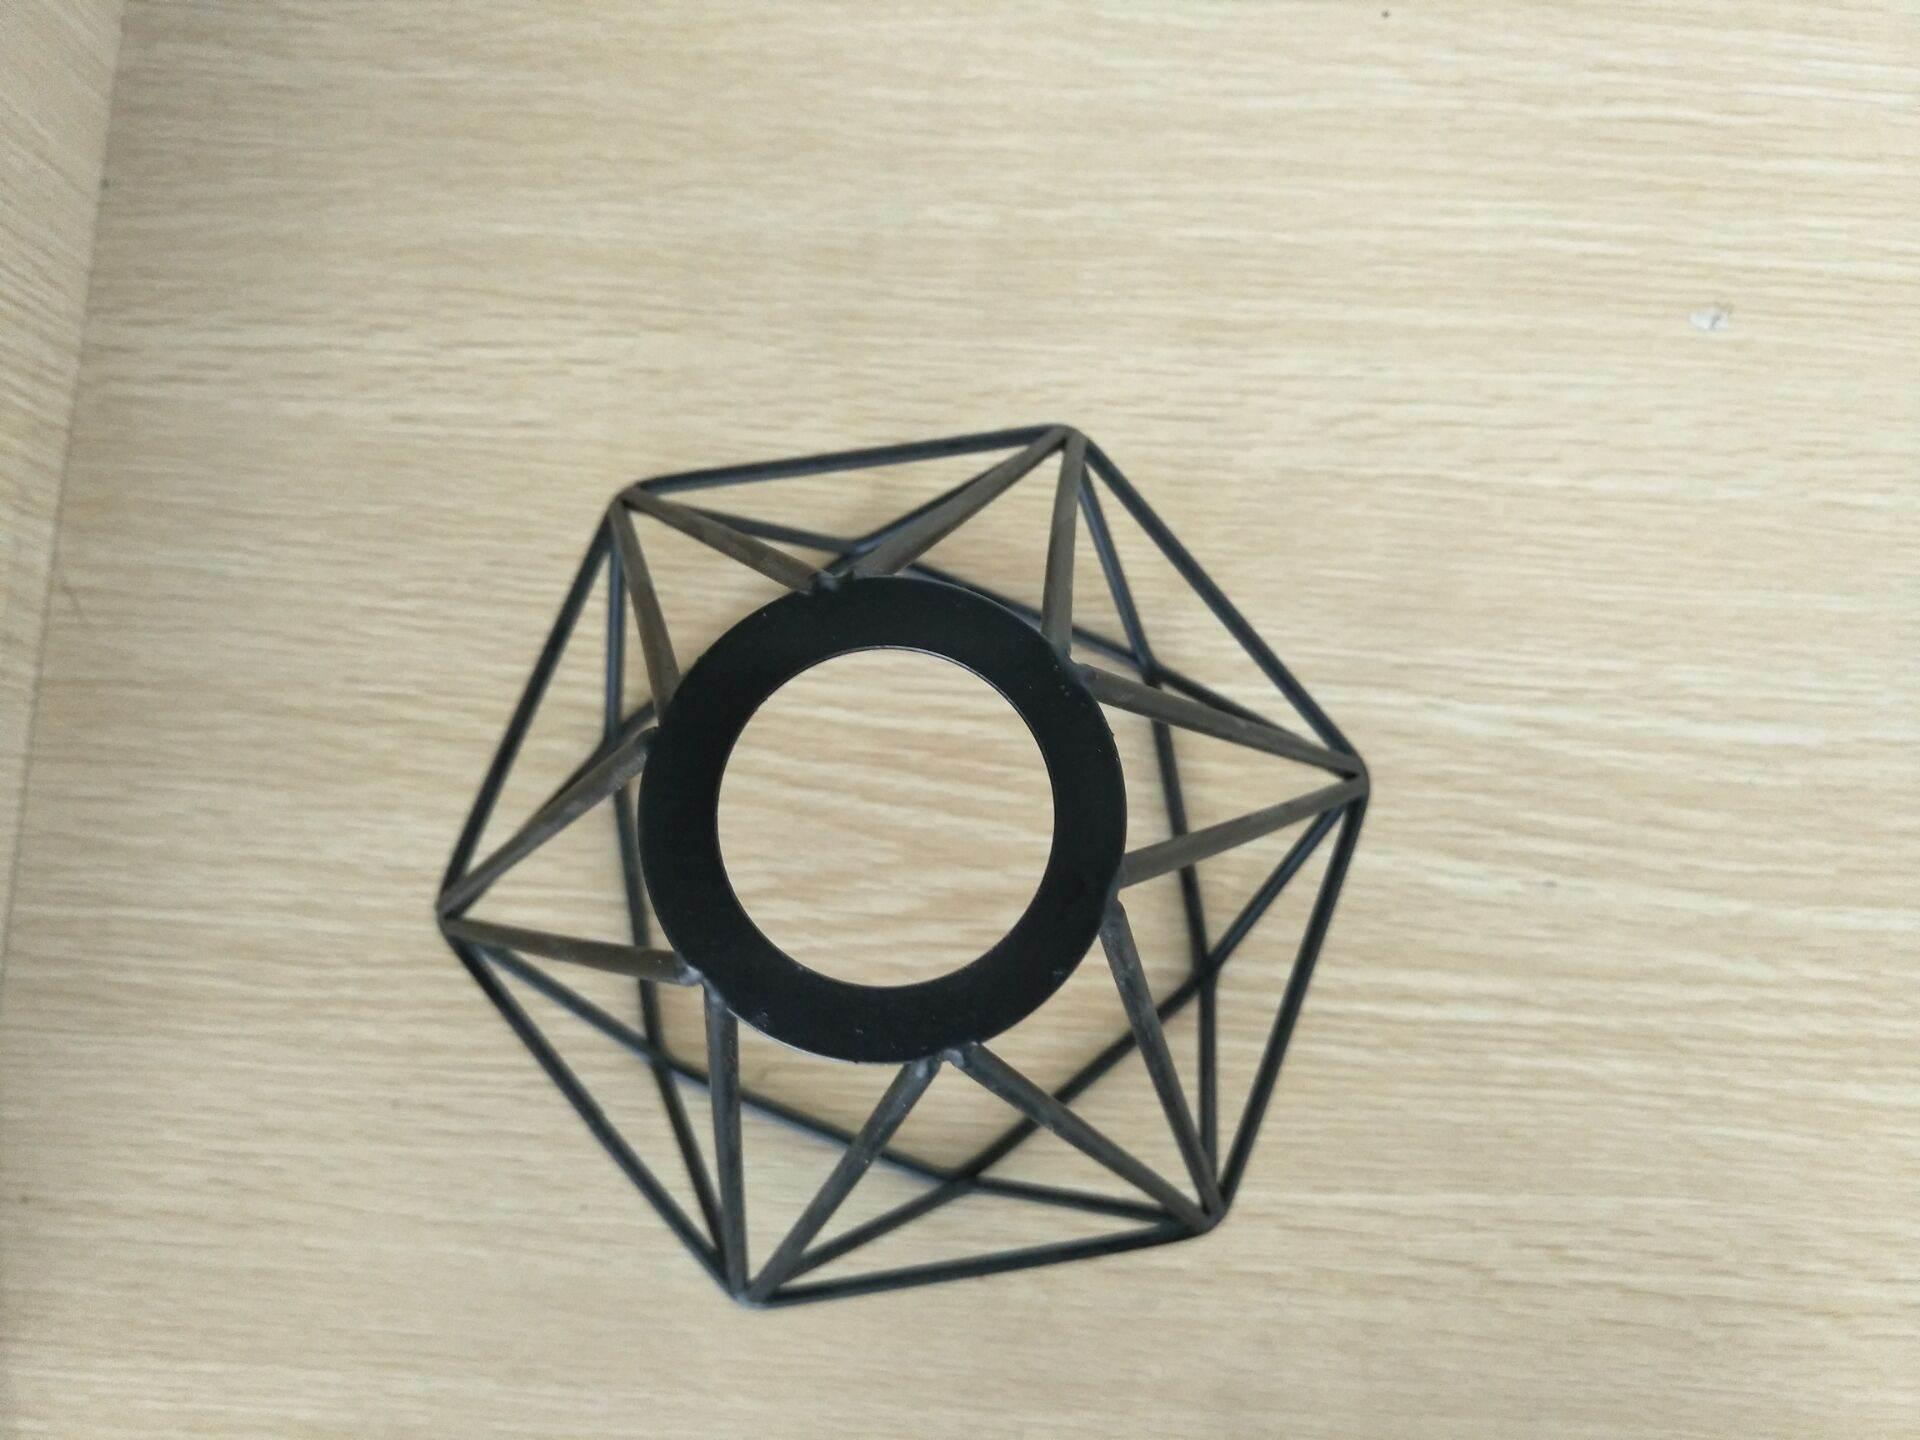 Online-Shop Diamant sharp schwarz retro edison vintage edison ...